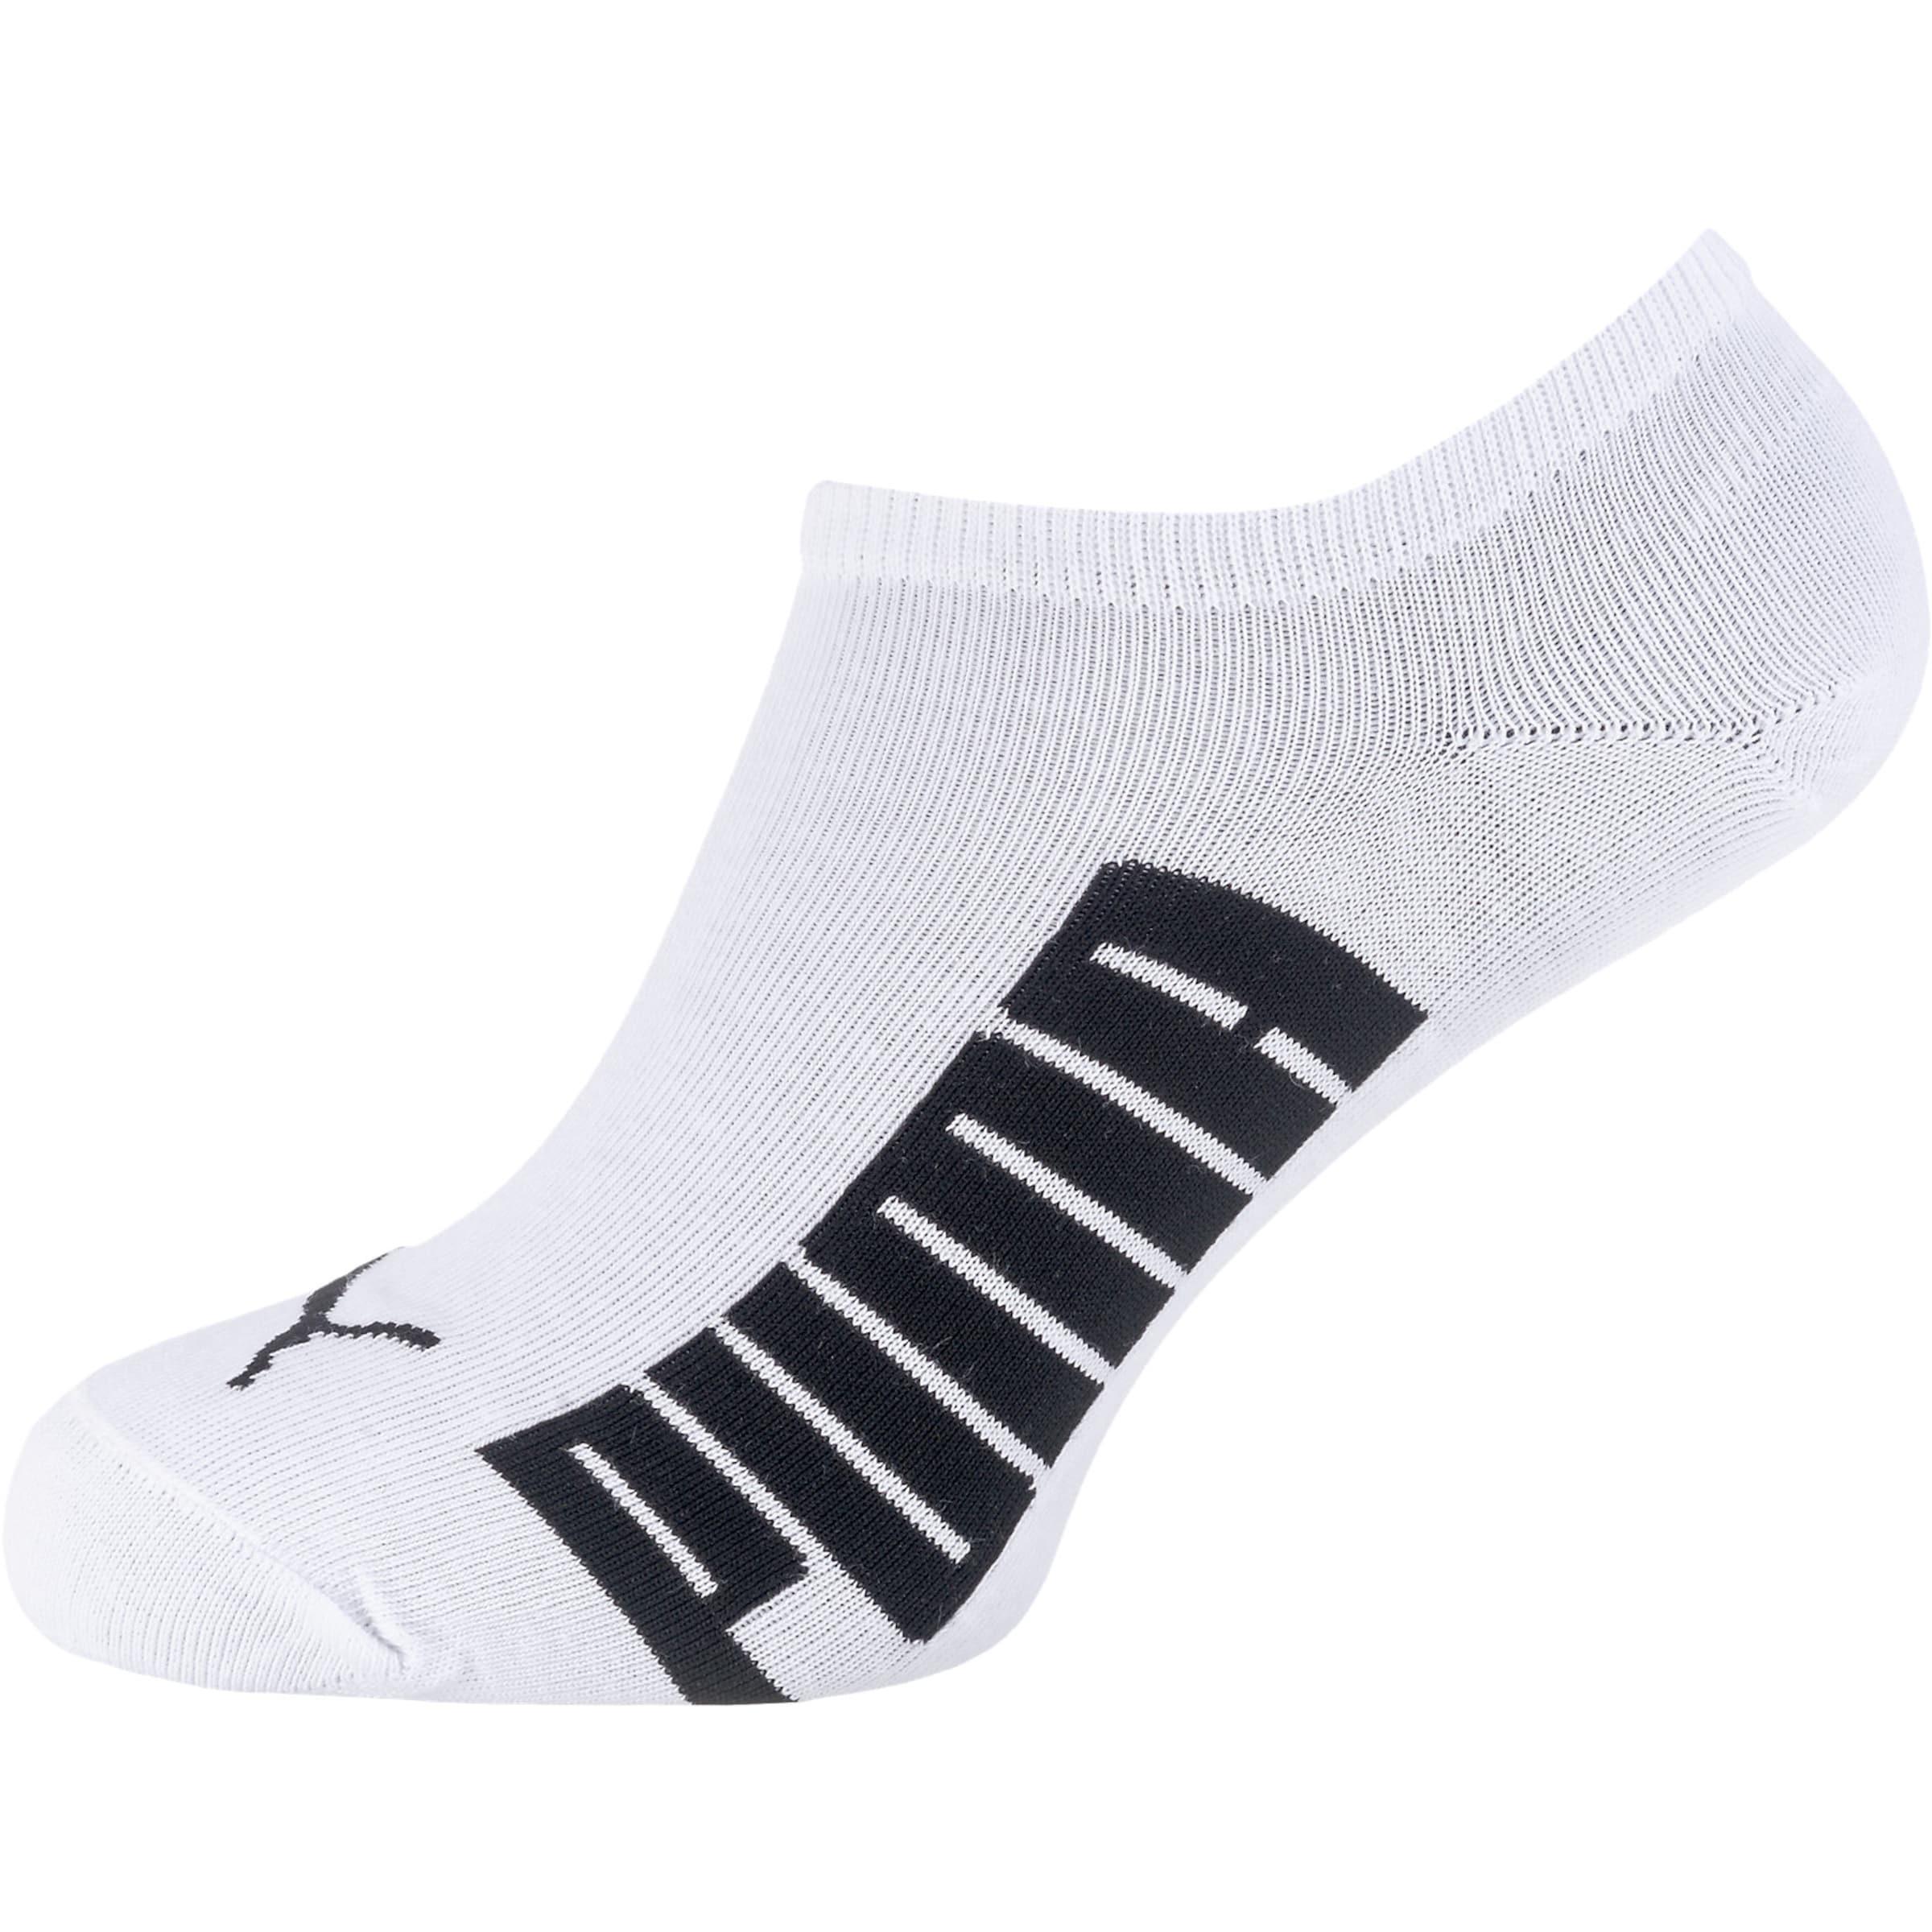 PUMA Sneakersocken Blick Zu Verkaufen x1rNJFEBd